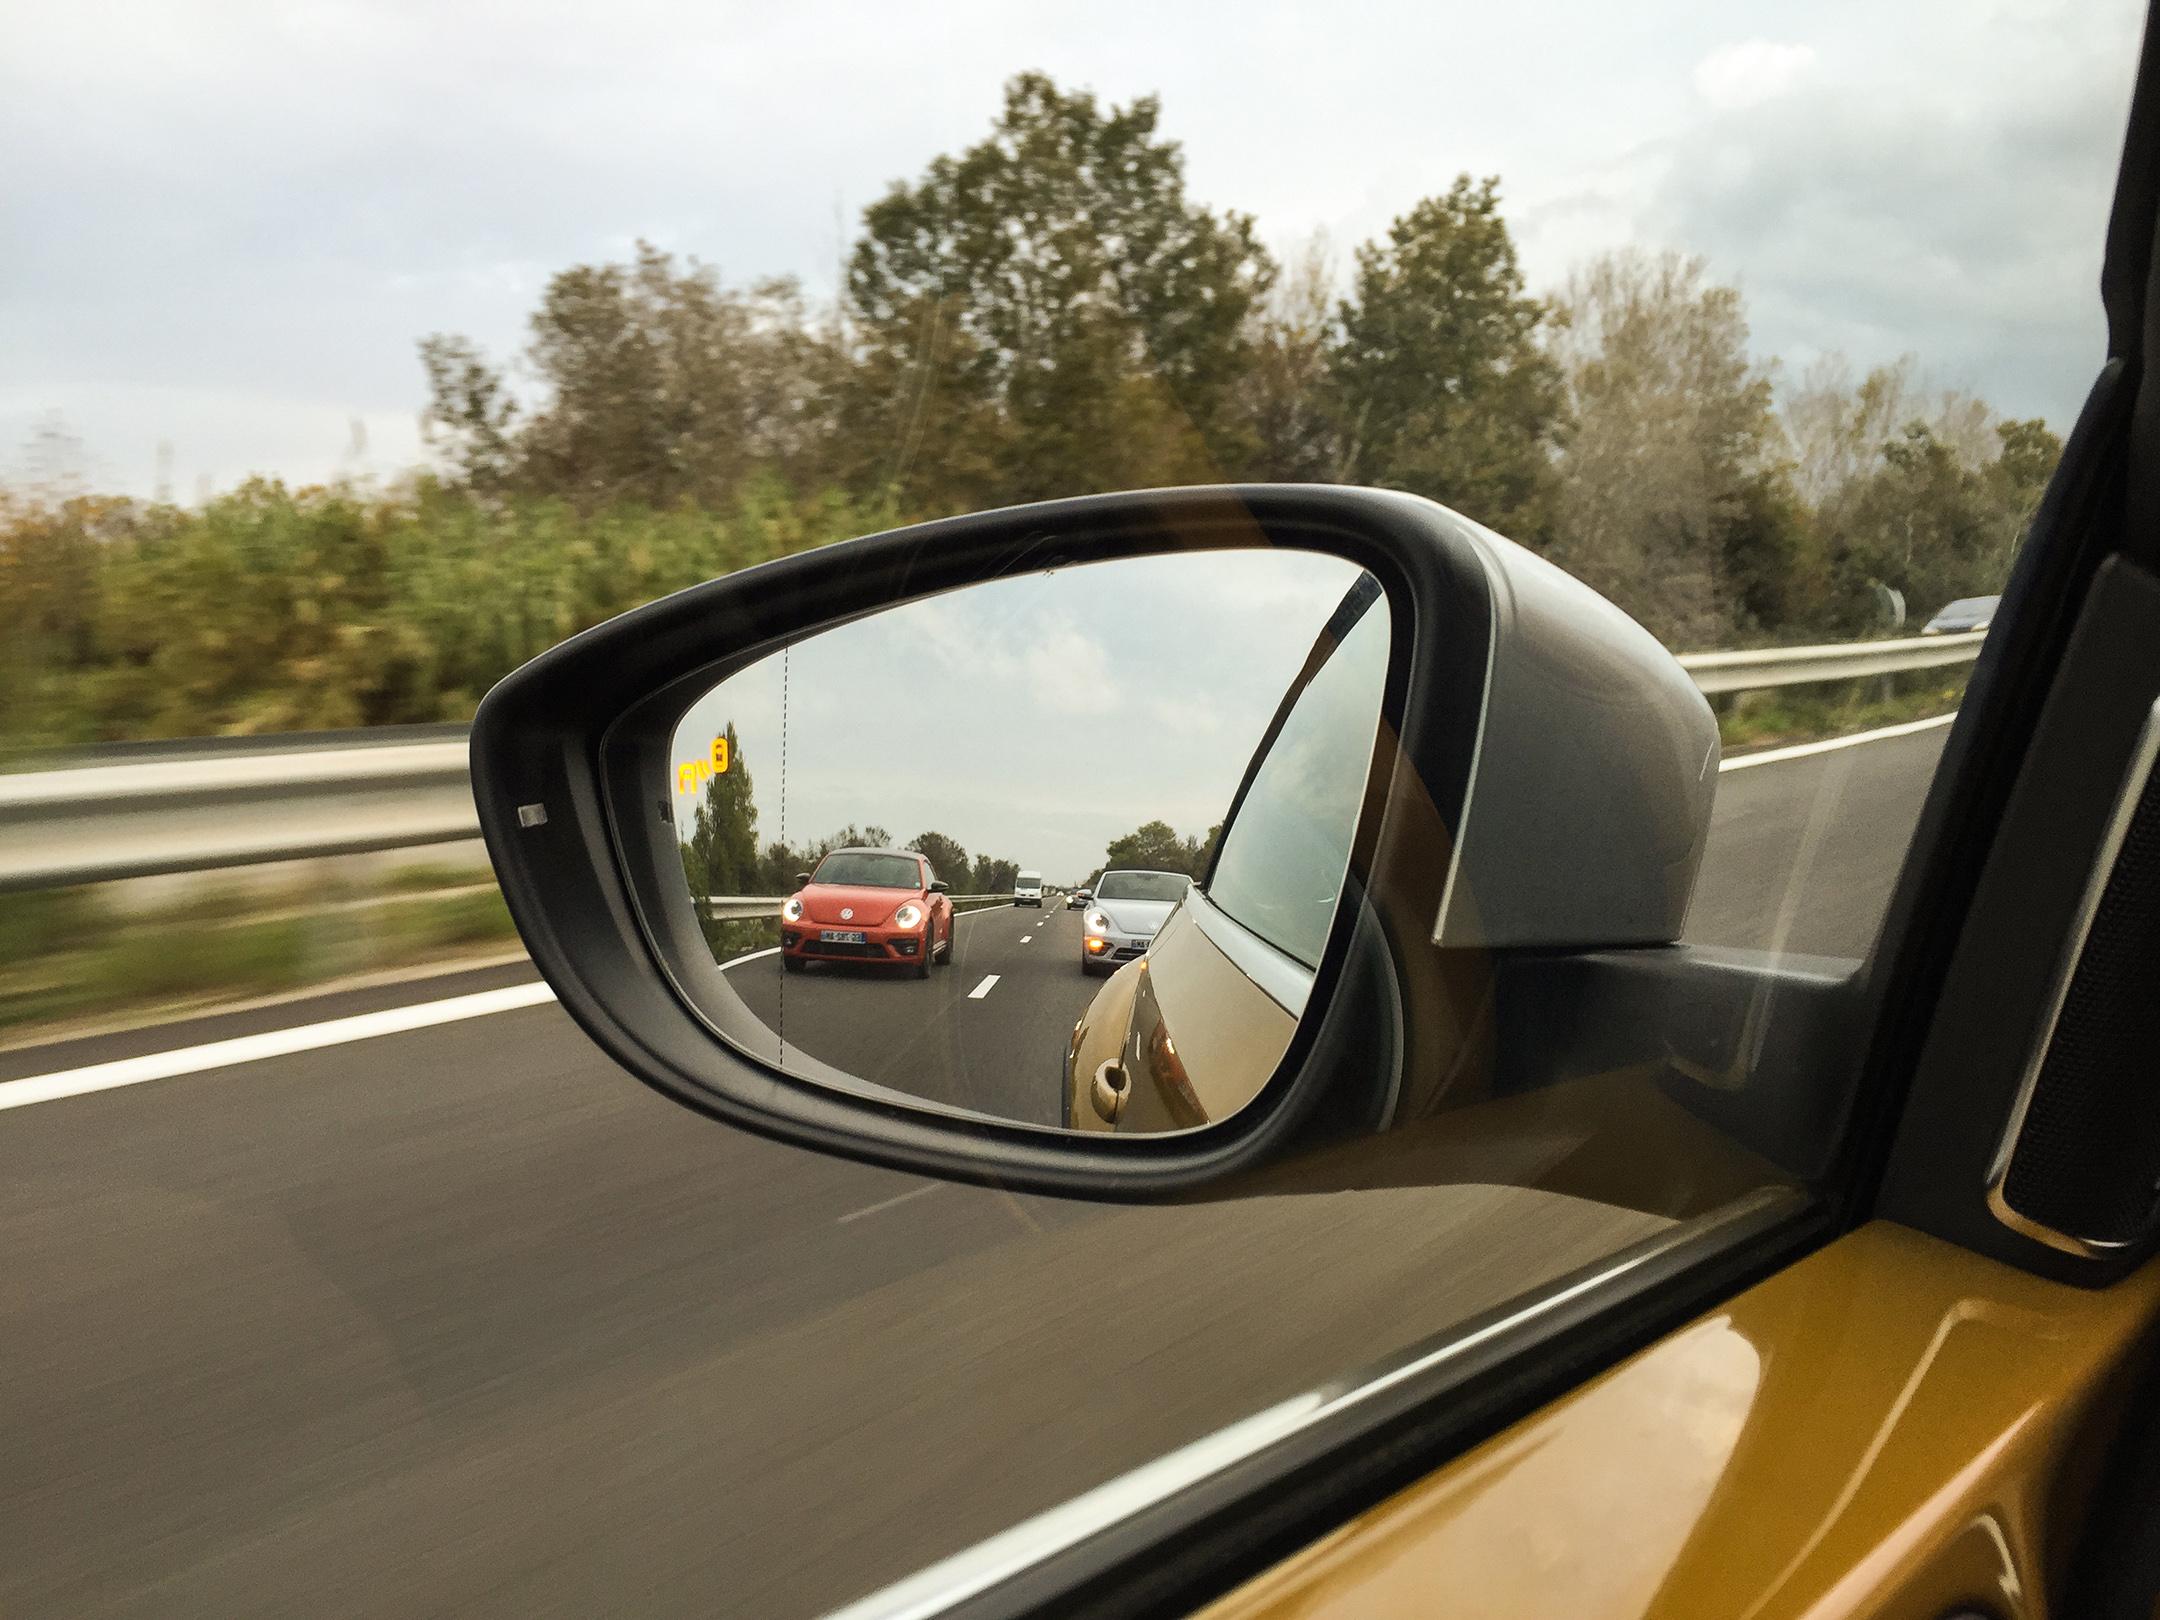 vwcox56-volkswagen-coccinelle-dune-cabriolet-interieur-arnaud-demasier-rsphotographievwcox56-volkswagen-coccinelle-dune-cabriolet-interieur-arnaud-demasier-rsphotographie